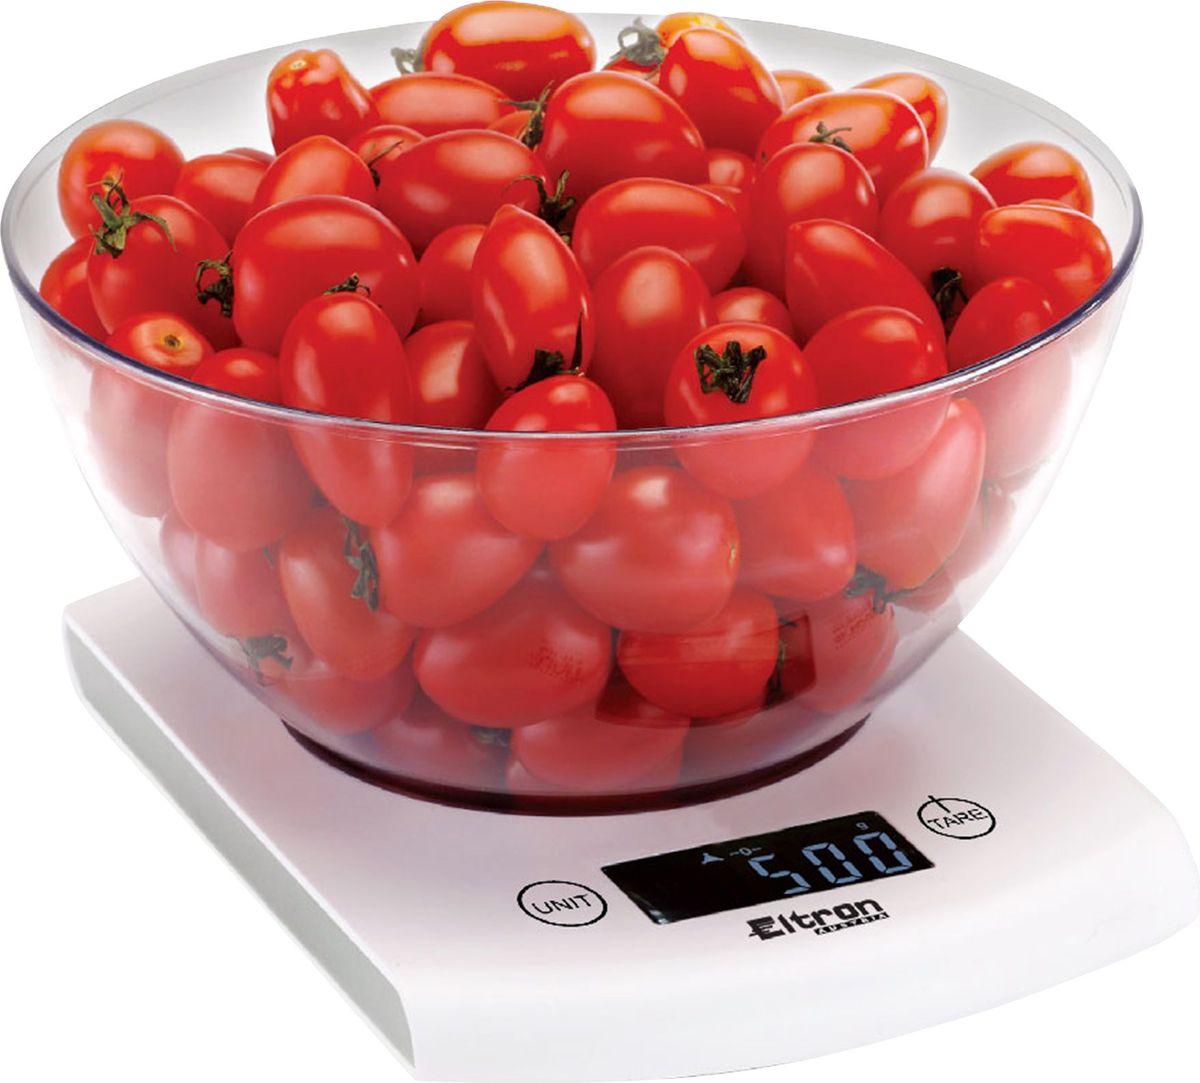 Весы кухонные Eltron, электронные, с чашей, цвет: белый, до 5 кг. 9262EL весы eltron весы электронные